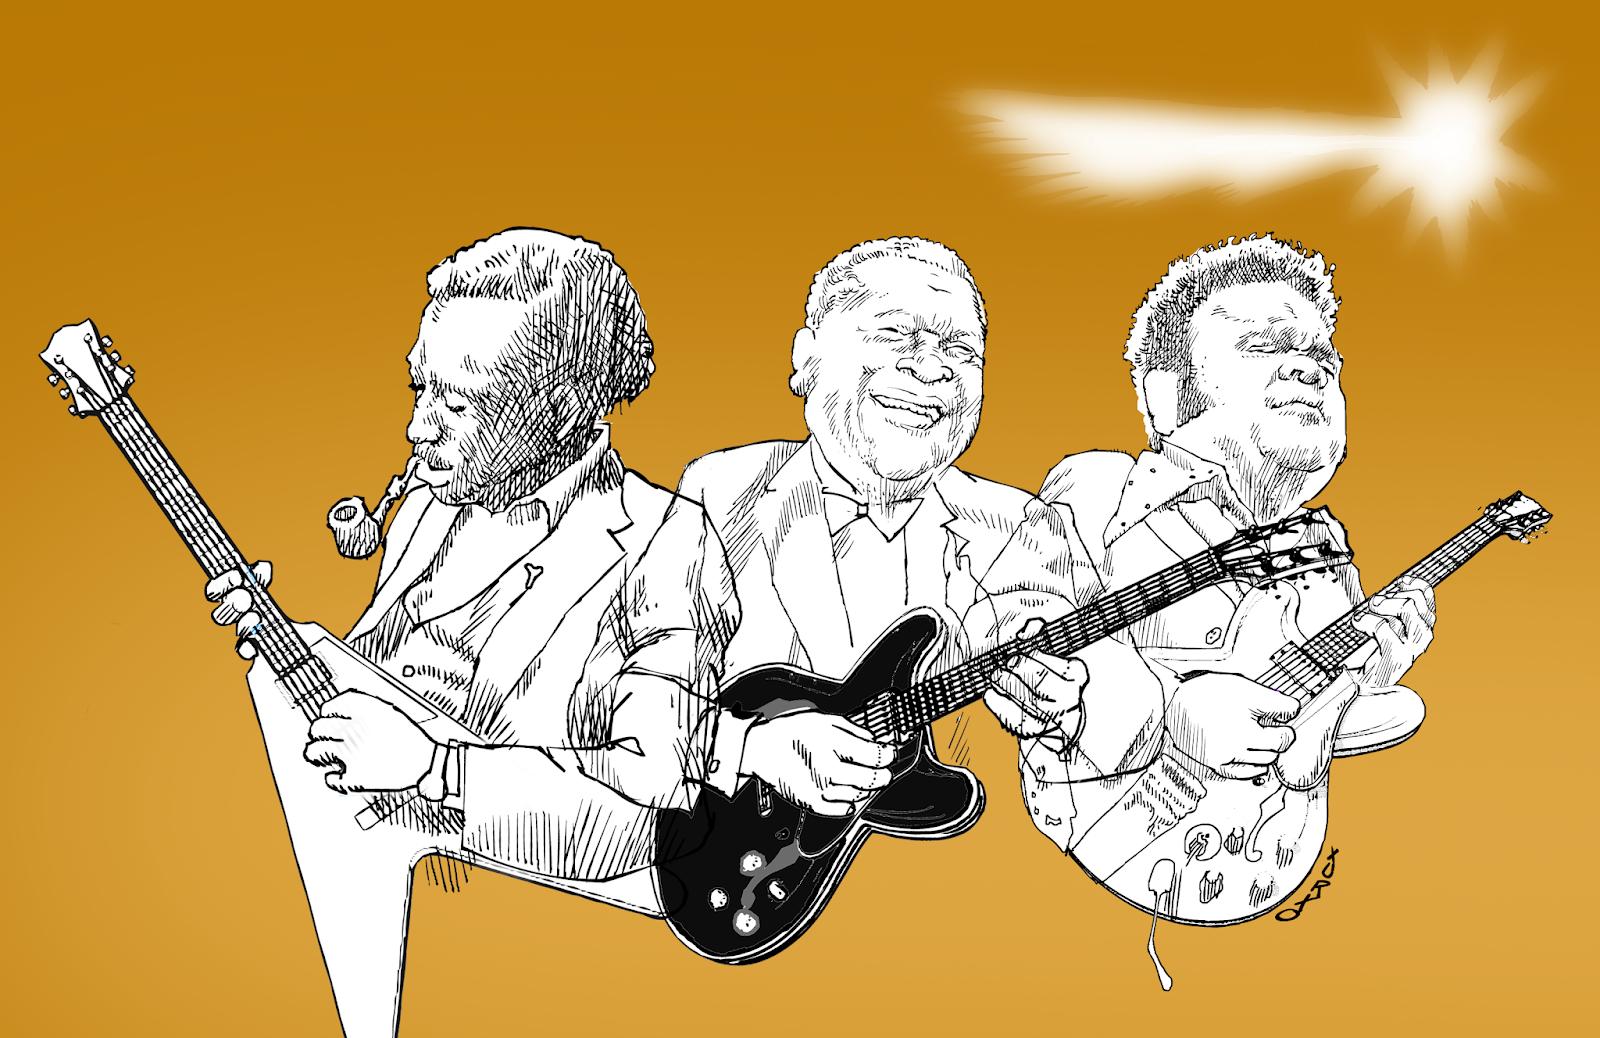 caricatura de los tres reyes del blues, Alfred King, B.B King y Freddie King